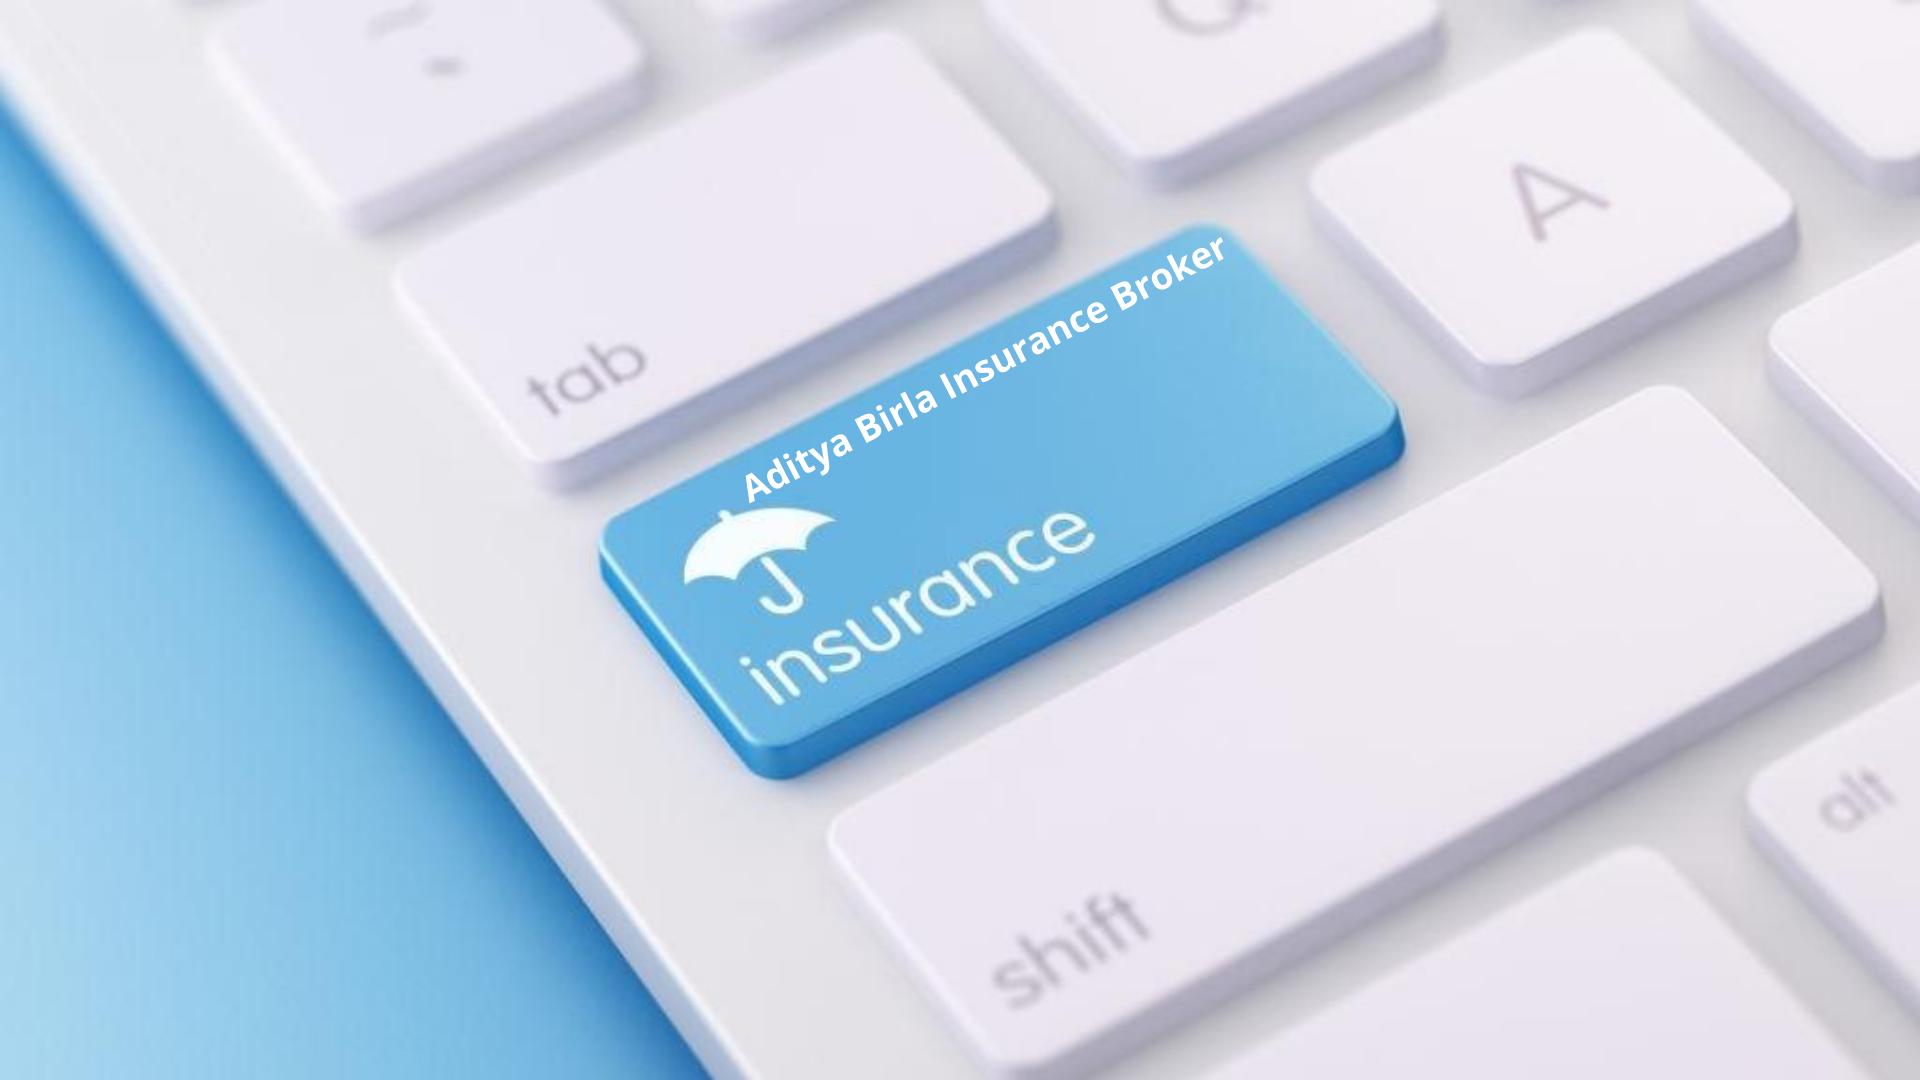 Aditya Birla Insurance Broker (ABIB Tvs insurance):